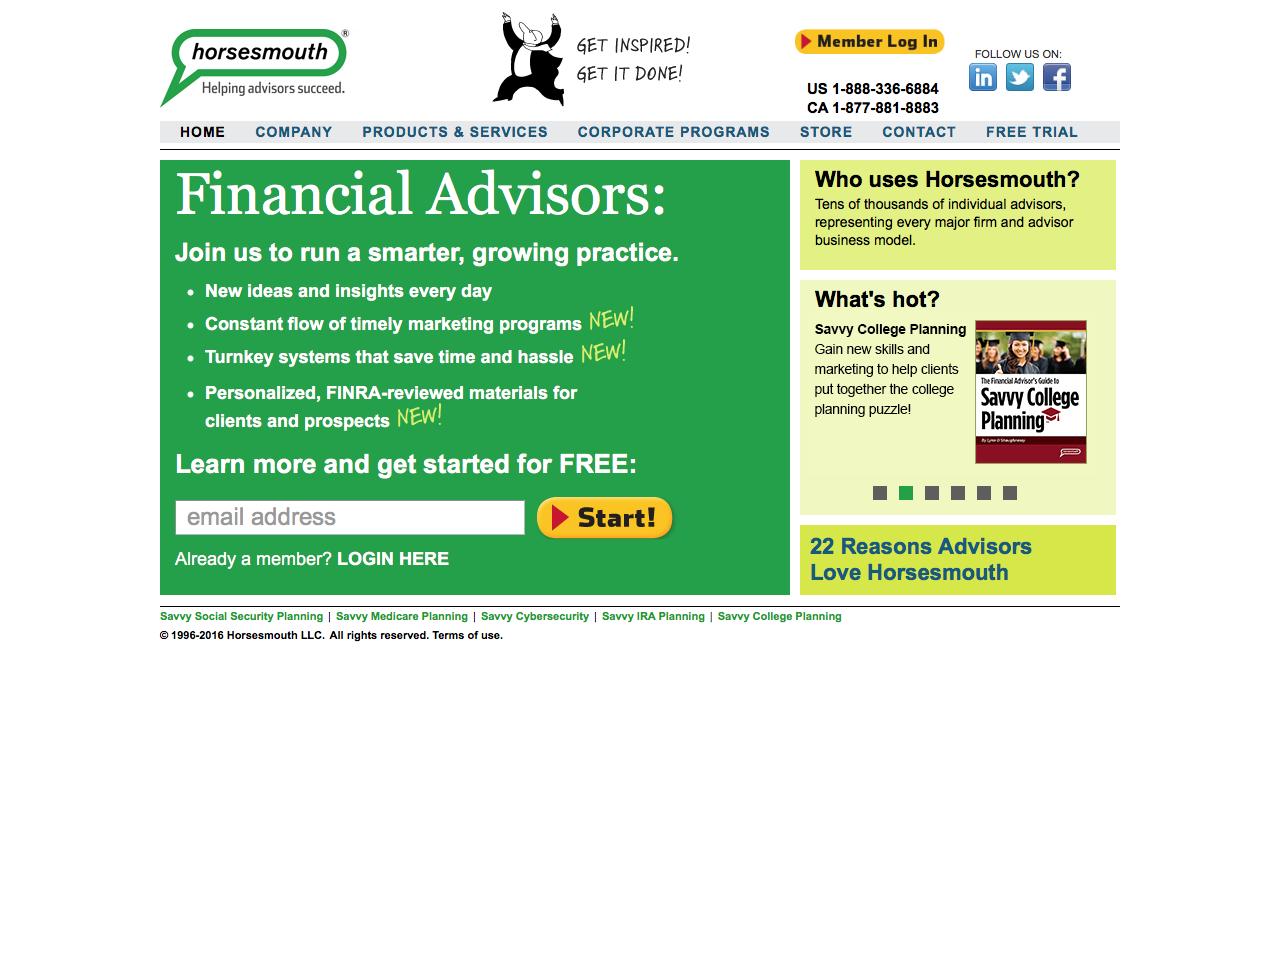 horsesmouth company profile office locations jobs key people